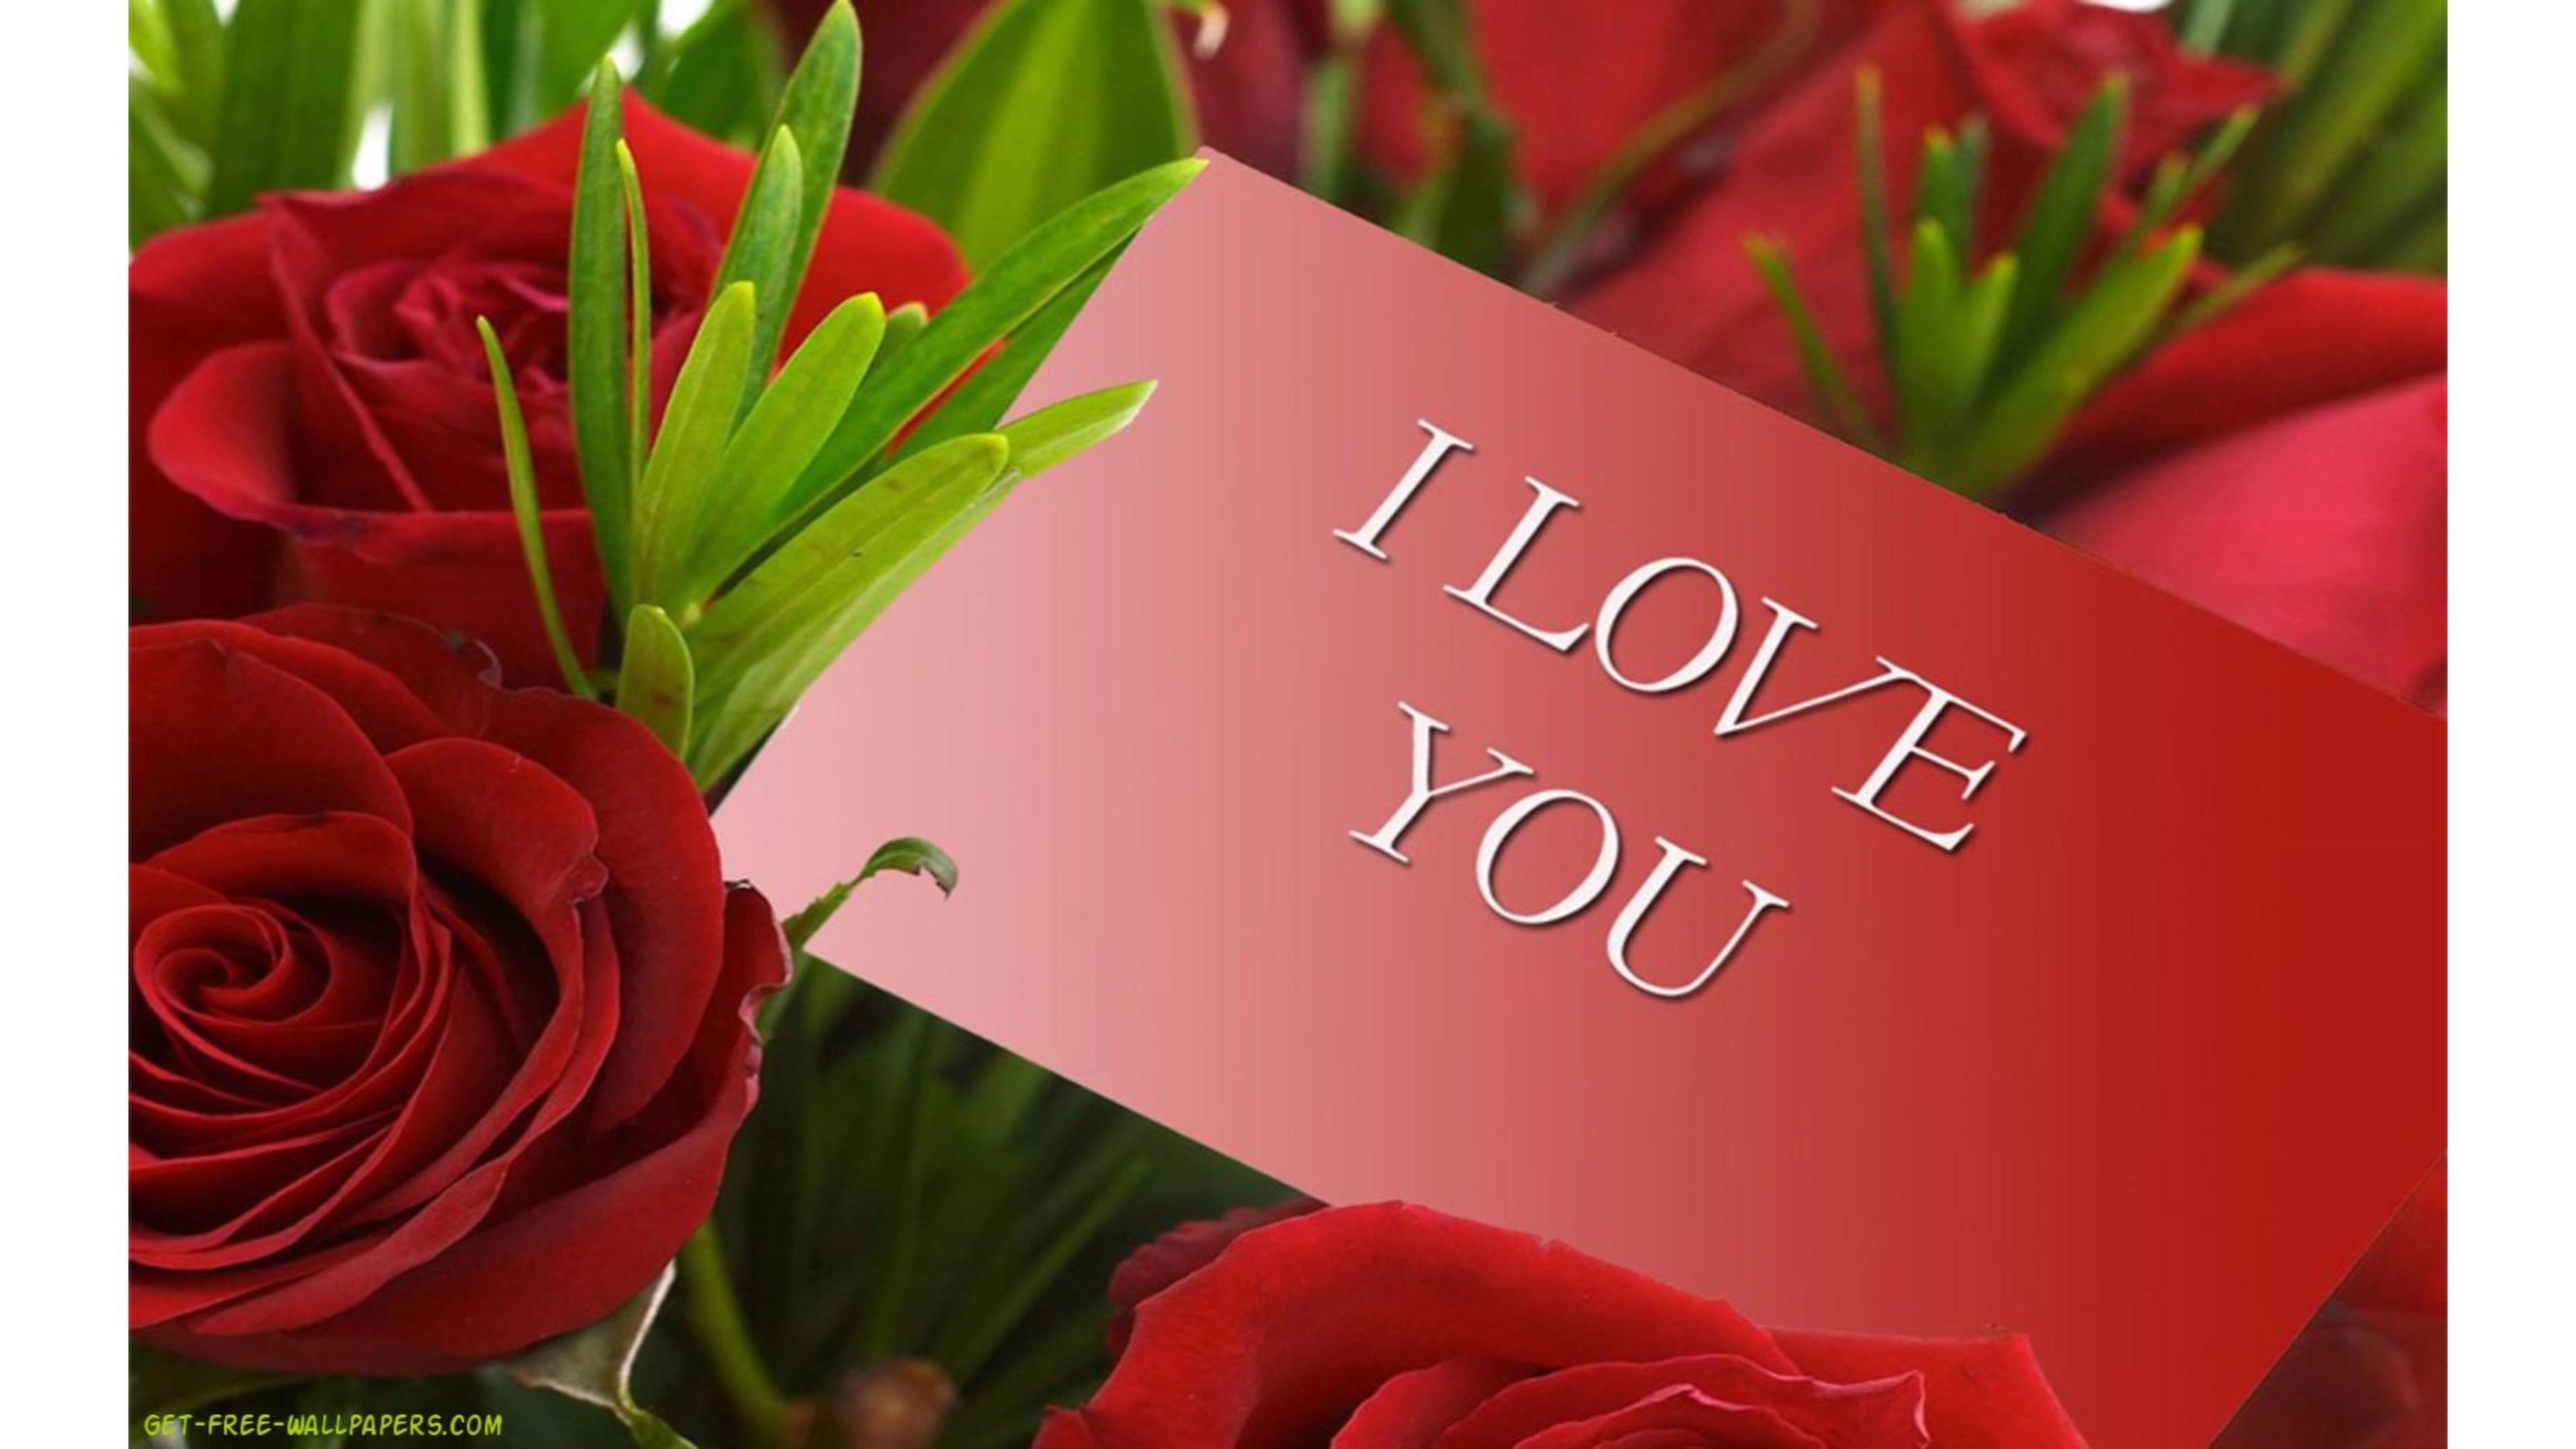 I Love You Aarti Name Wallpaper - 3840x2160 - Download HD ...